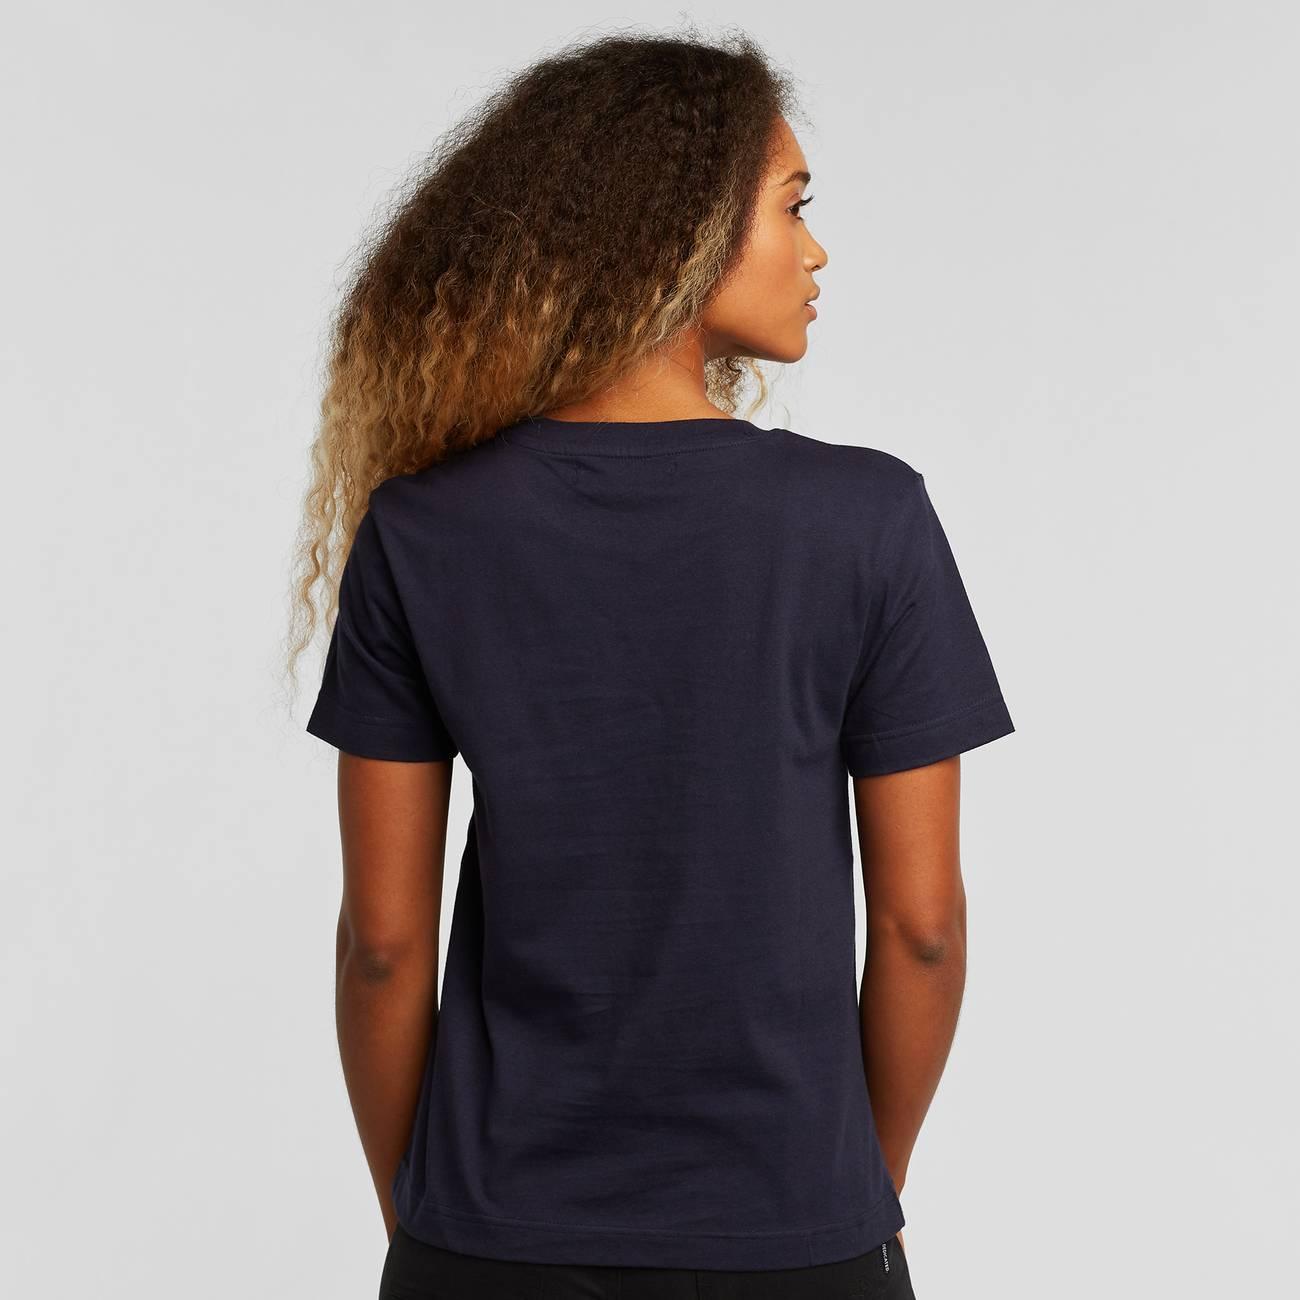 T-shirt Mysen Charlie Brown Navy